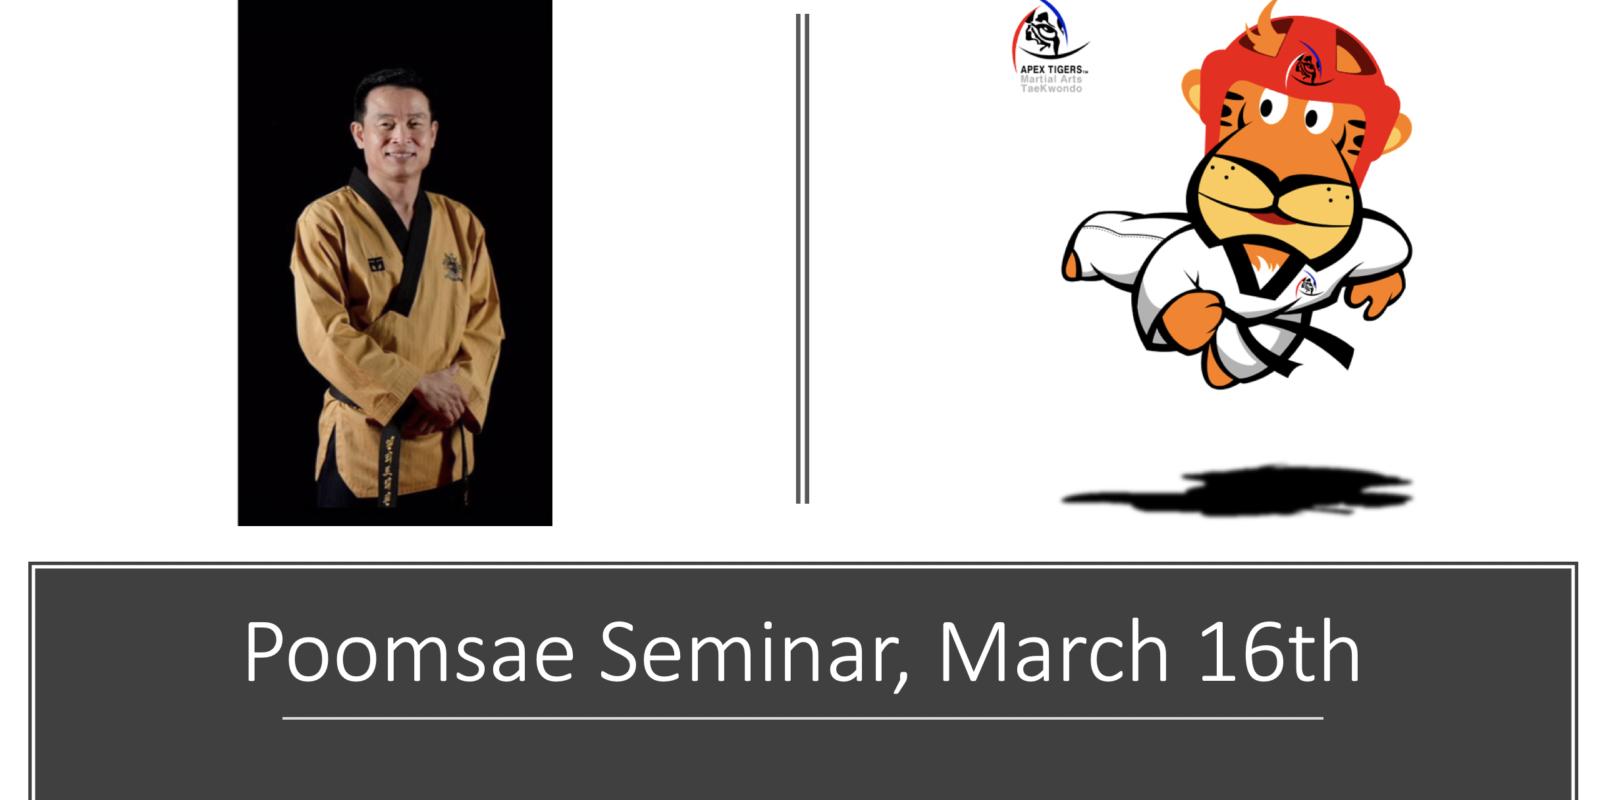 Taekwondo Poomsae Seminar